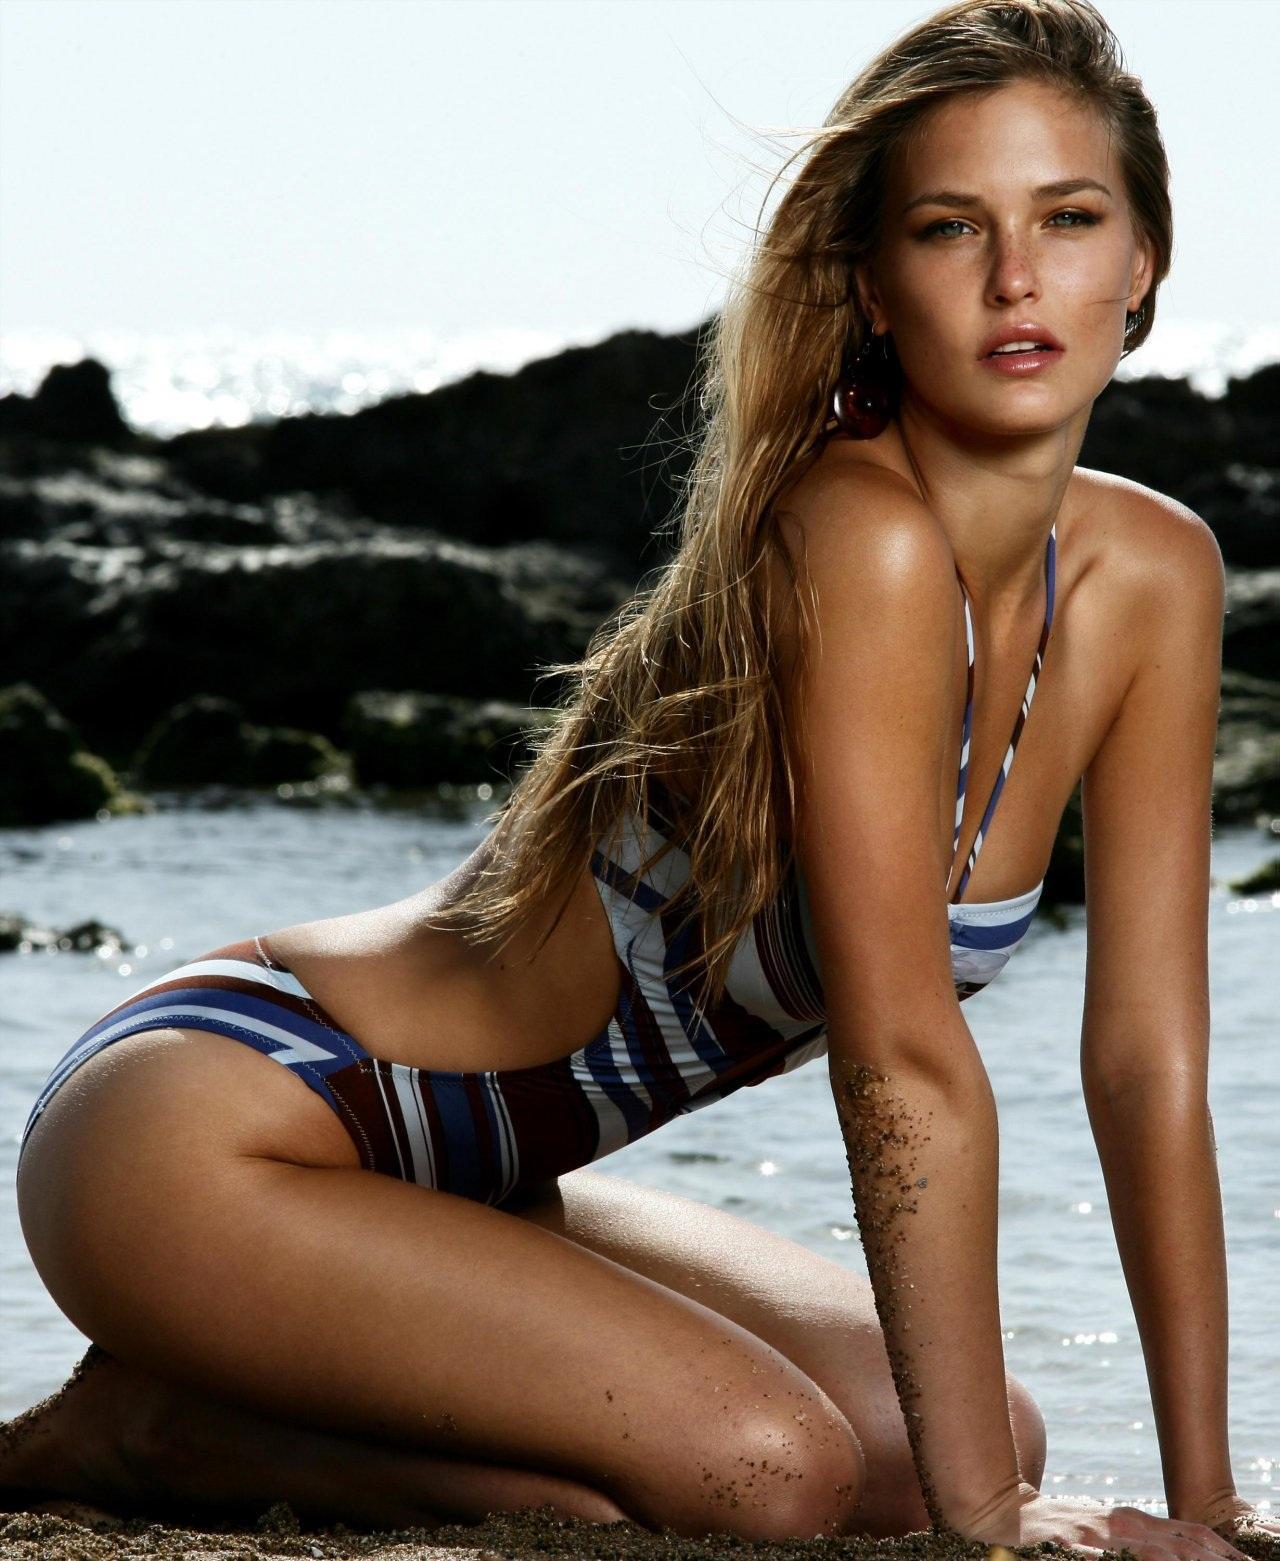 http://4.bp.blogspot.com/-_tu0sjy2q2s/UN-BtA2ibEI/AAAAAAAAAMY/_LqiDIp7YQs/s1600/bar-refaeli-sexy-1865809078.jpg